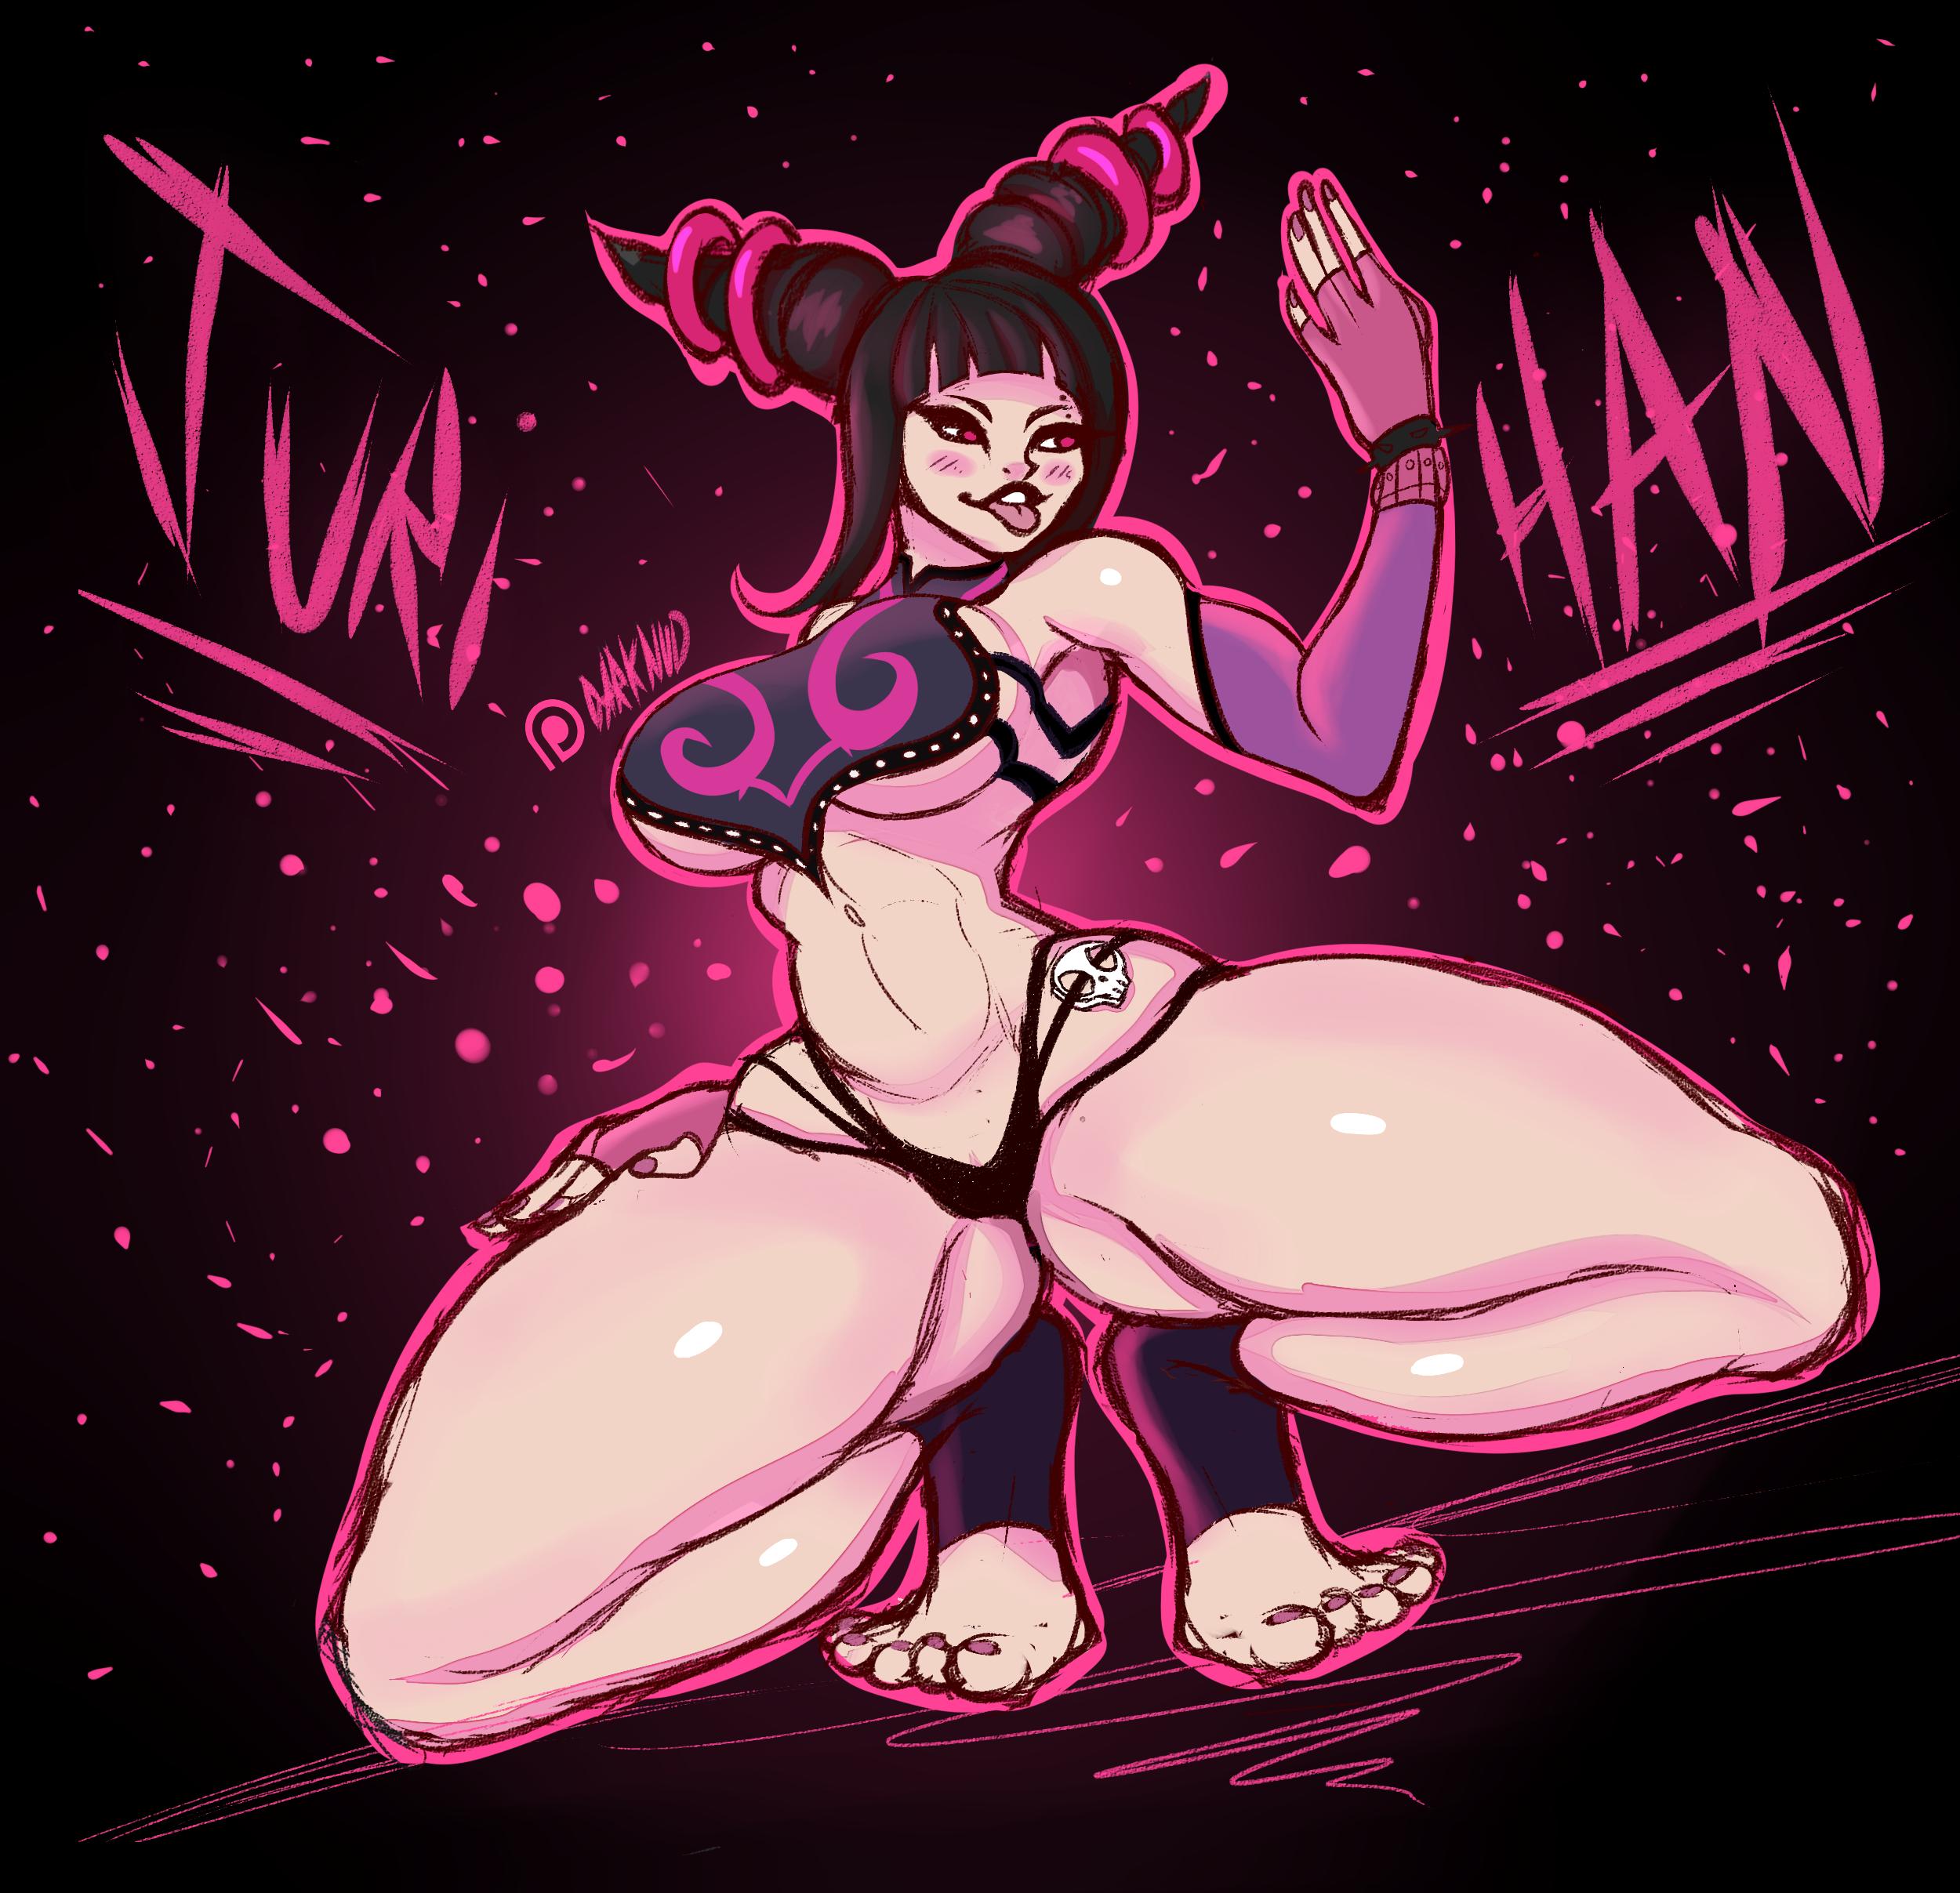 Juri-Han